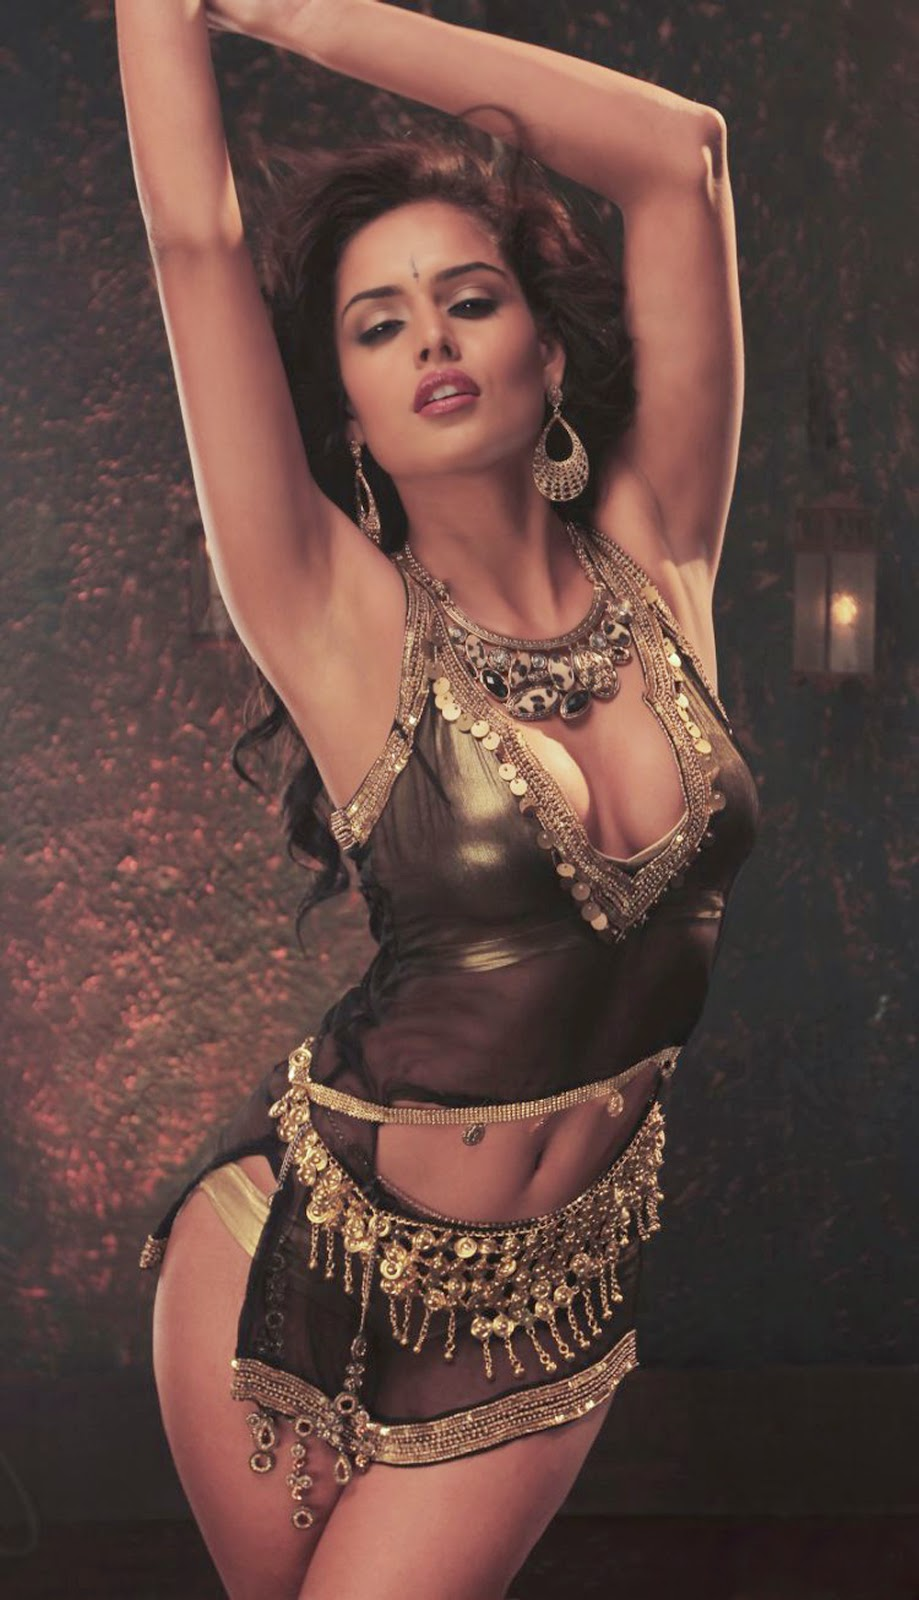 Nathalia Kaur hot images